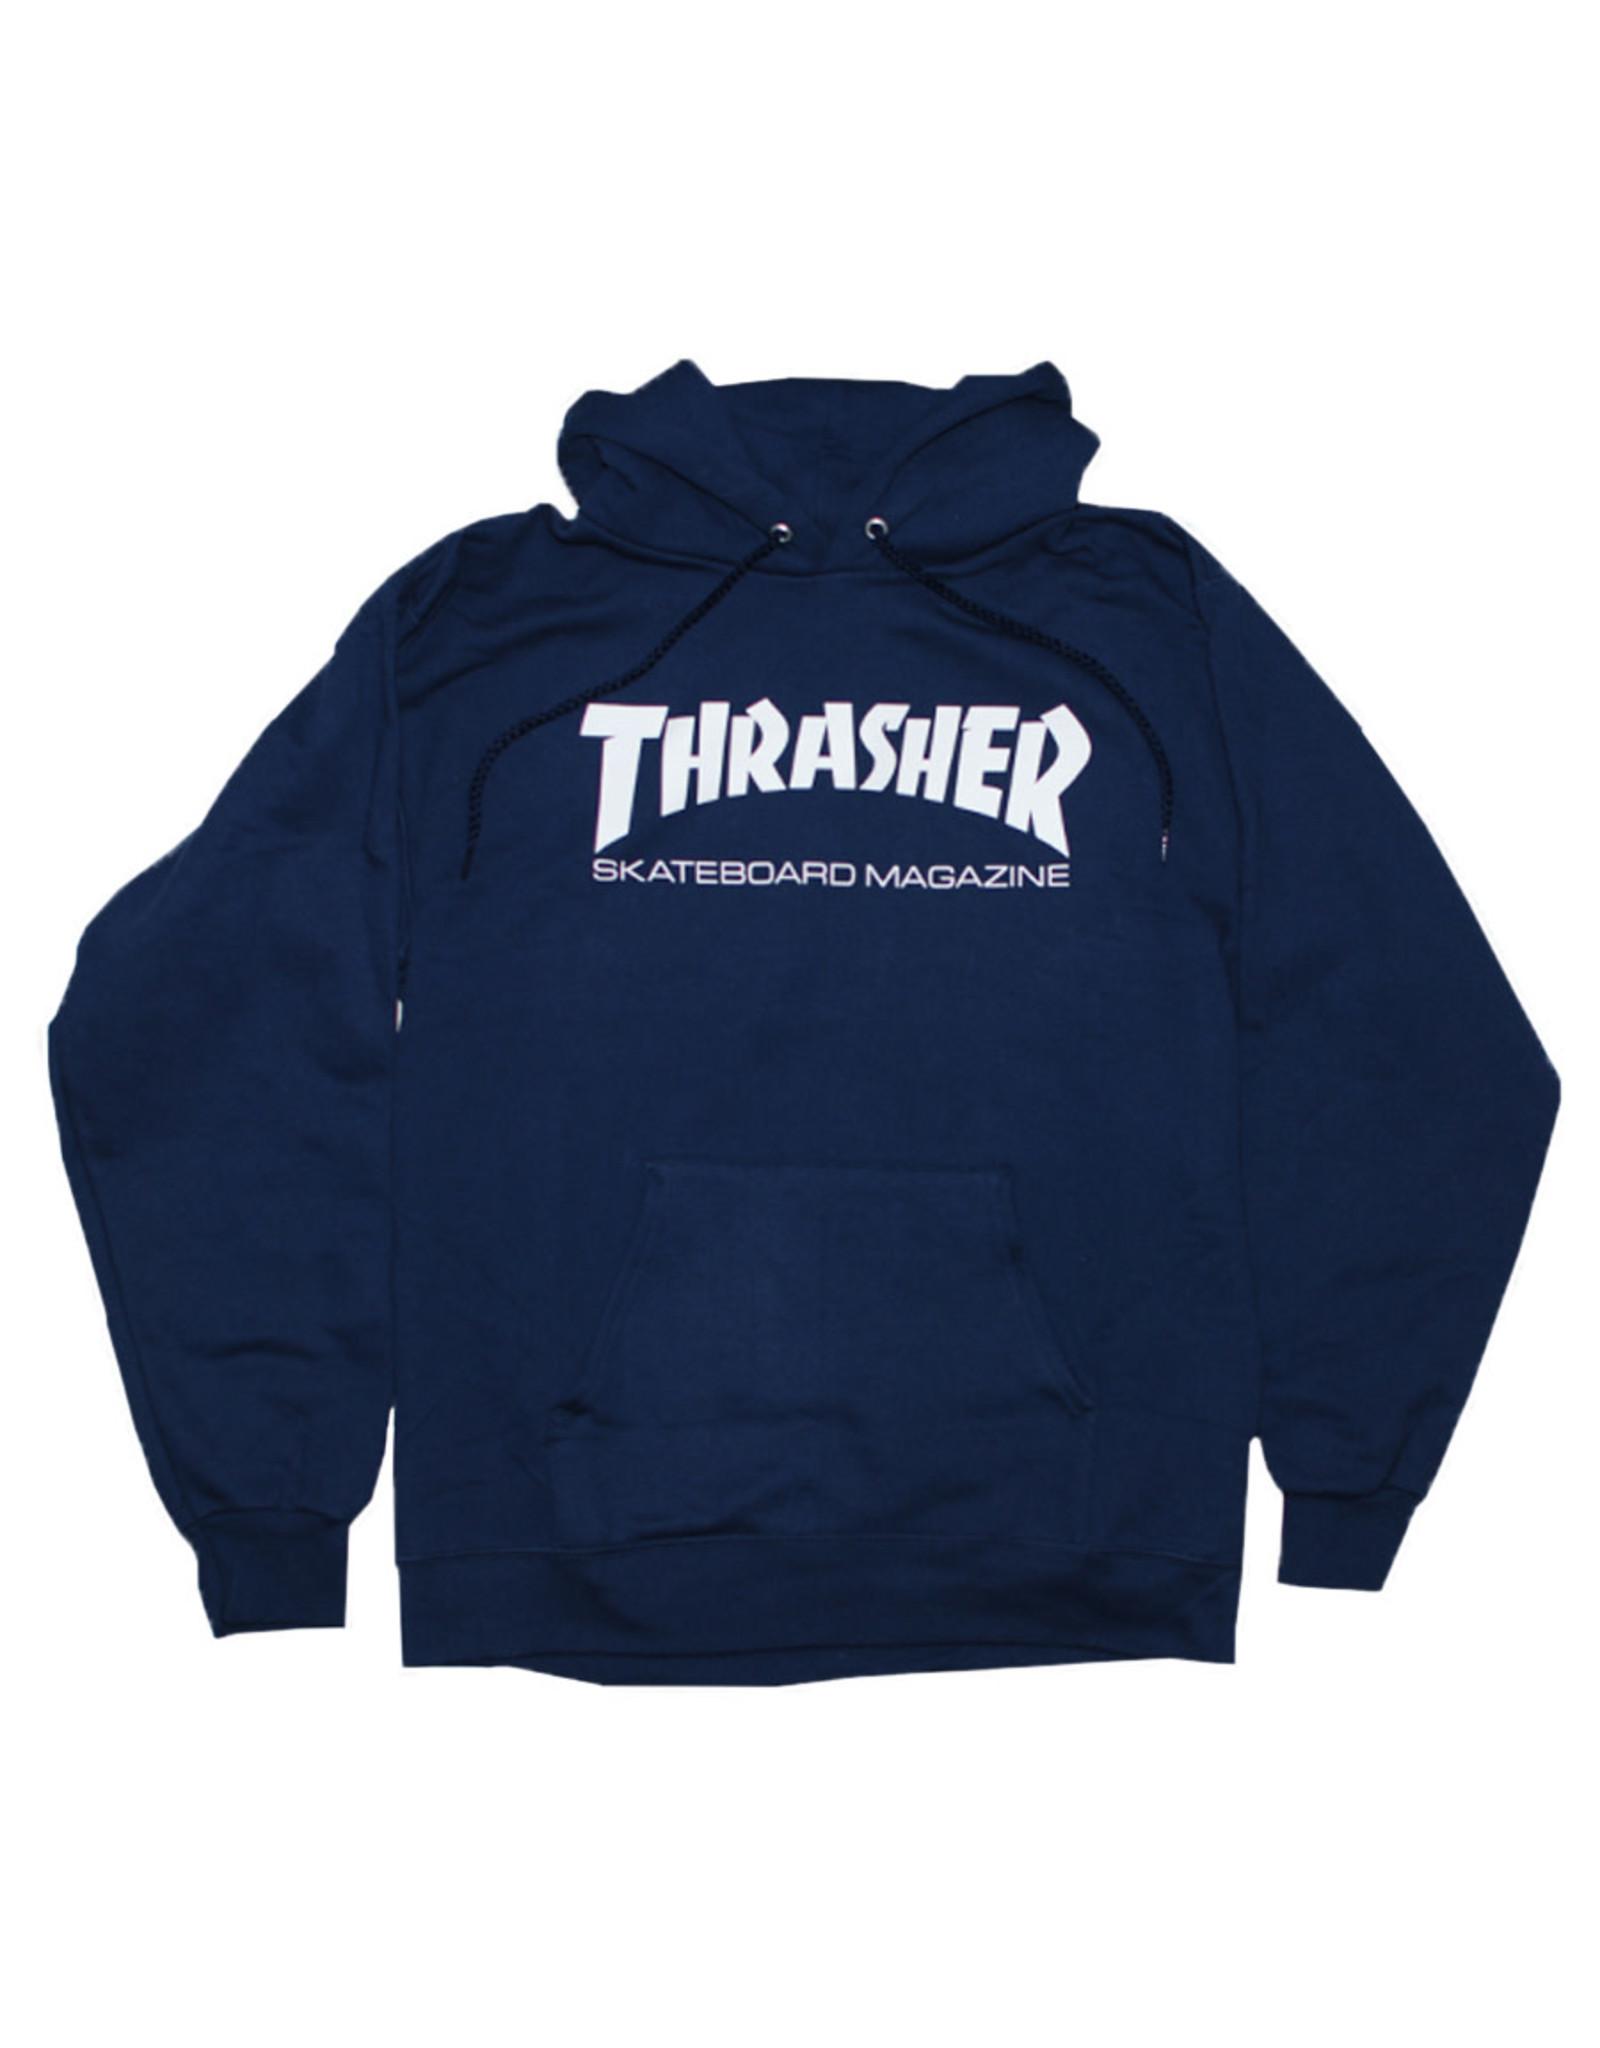 Thrasher Thrasher Hood Mens Sk8 Mag (Navy Blue)